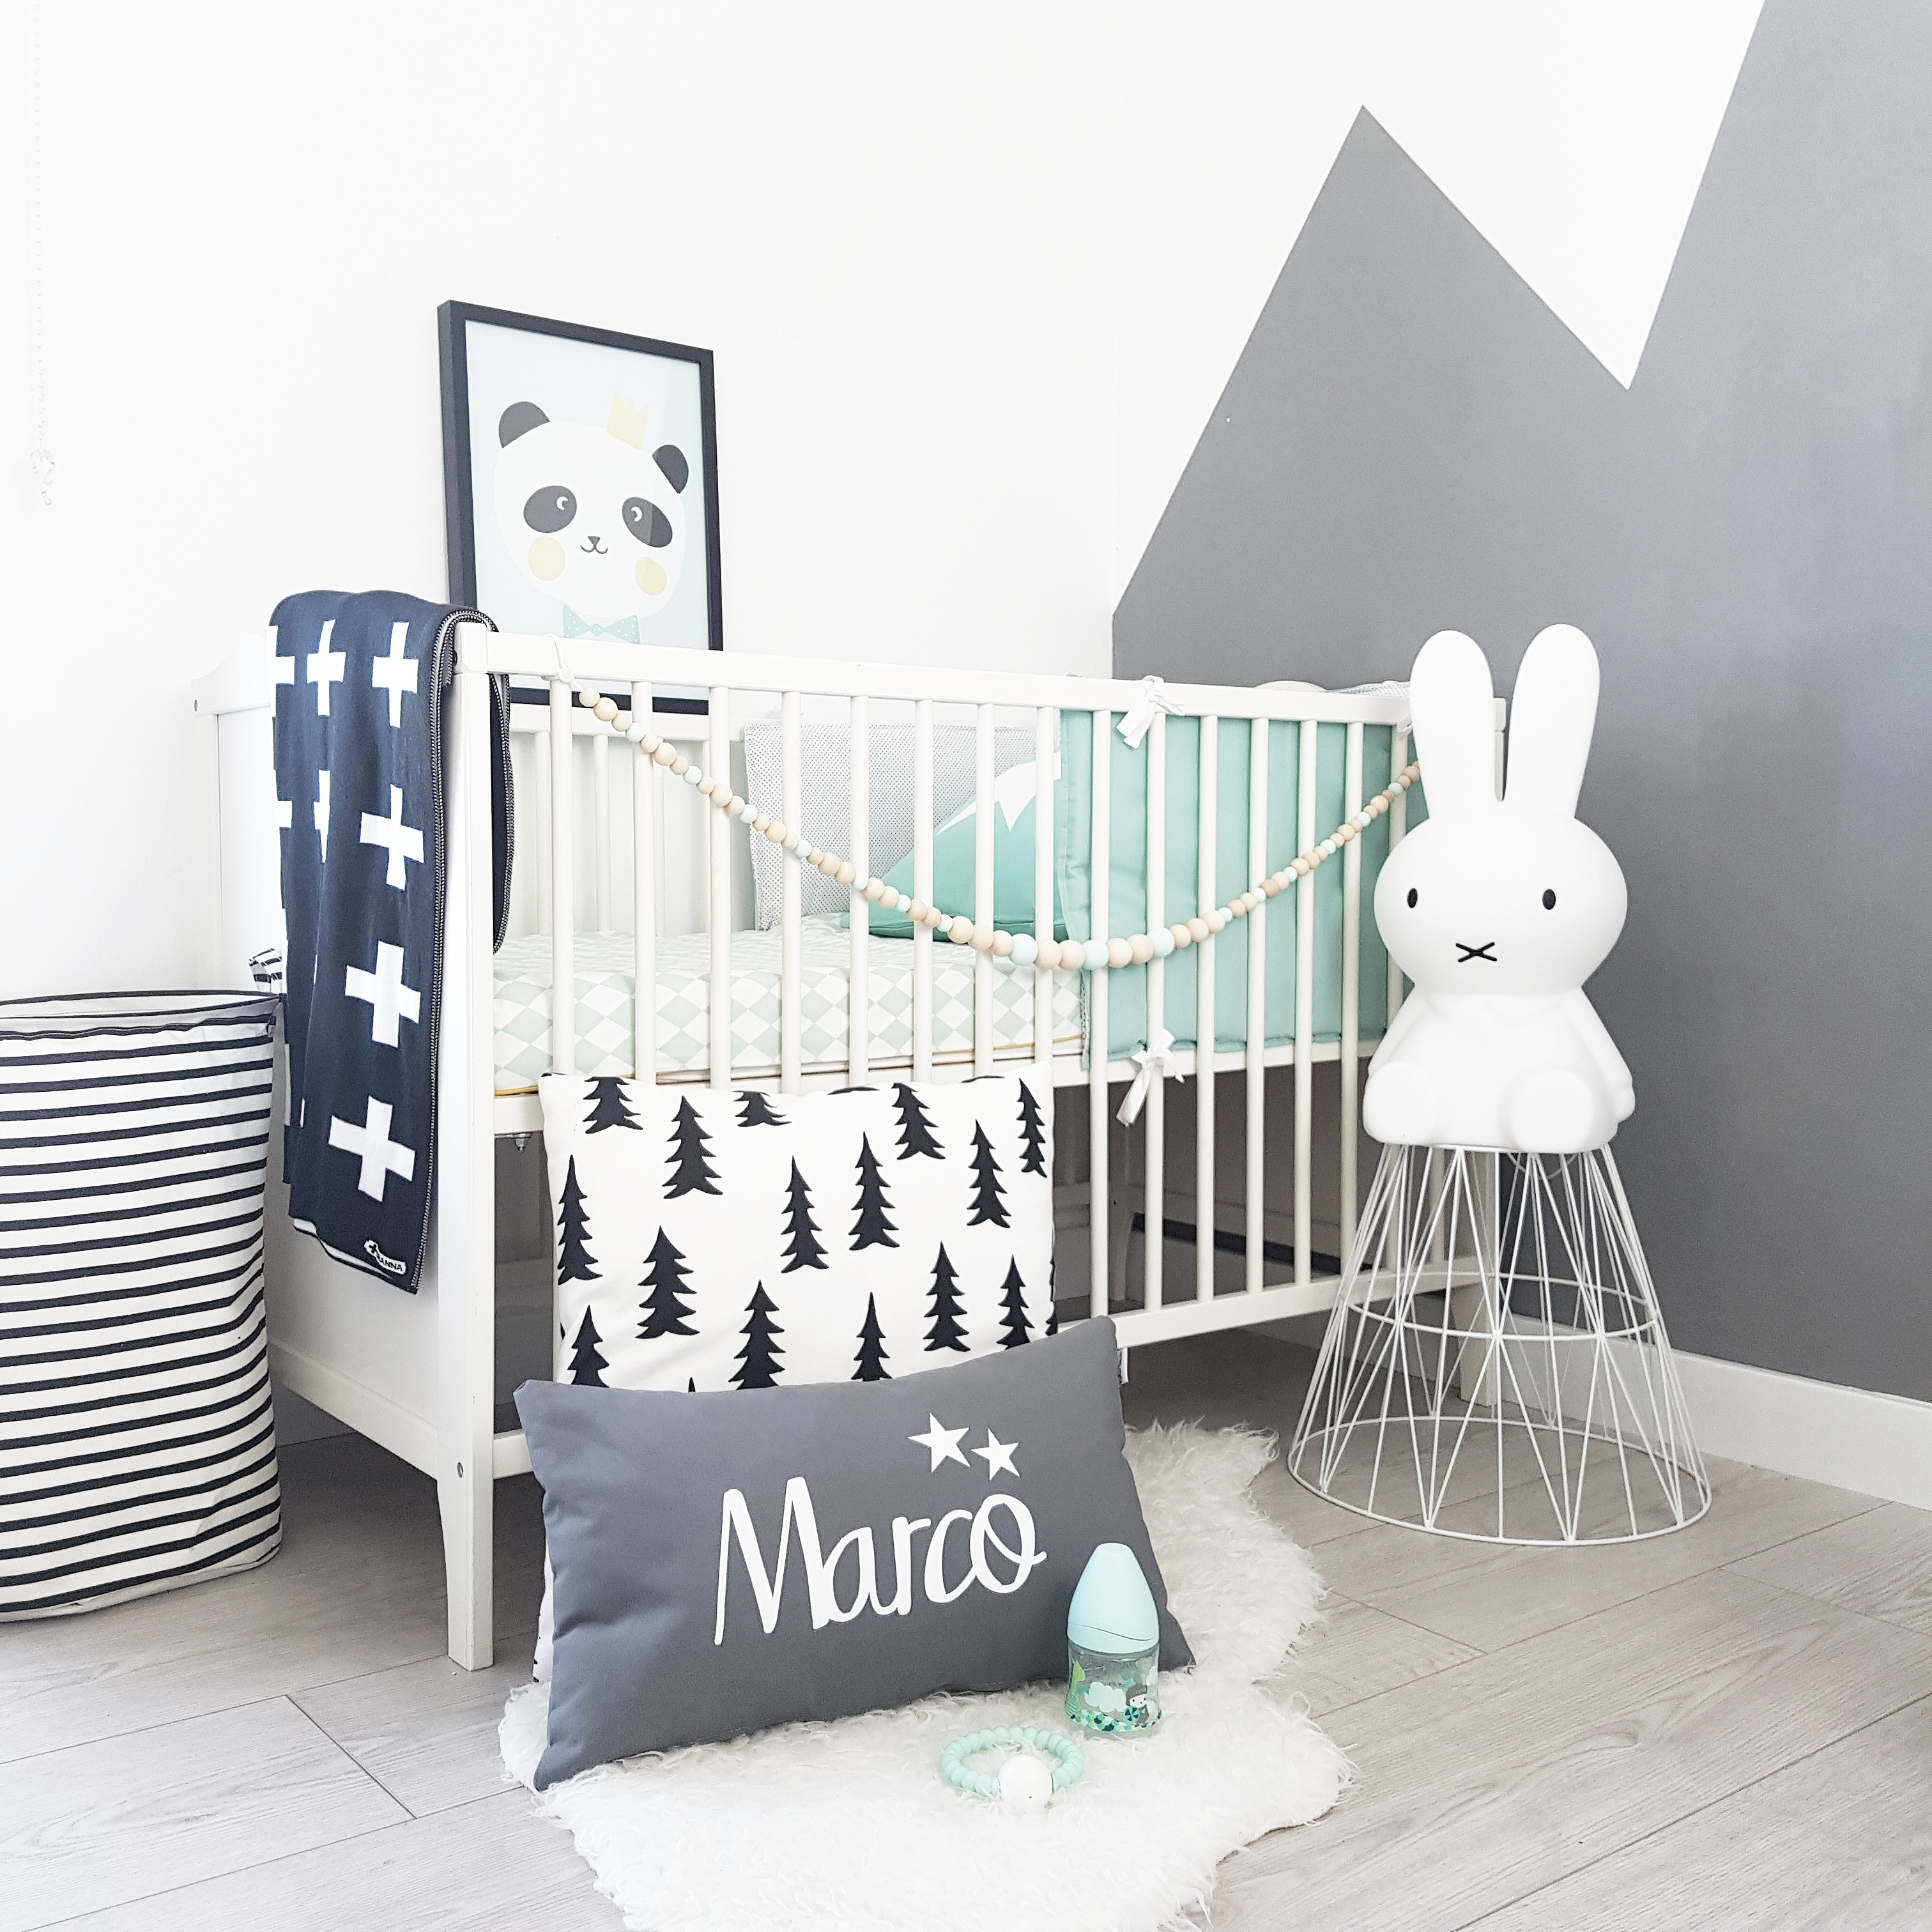 Habitación infantil en tonos grises, blancos y mint - Deco&Kids